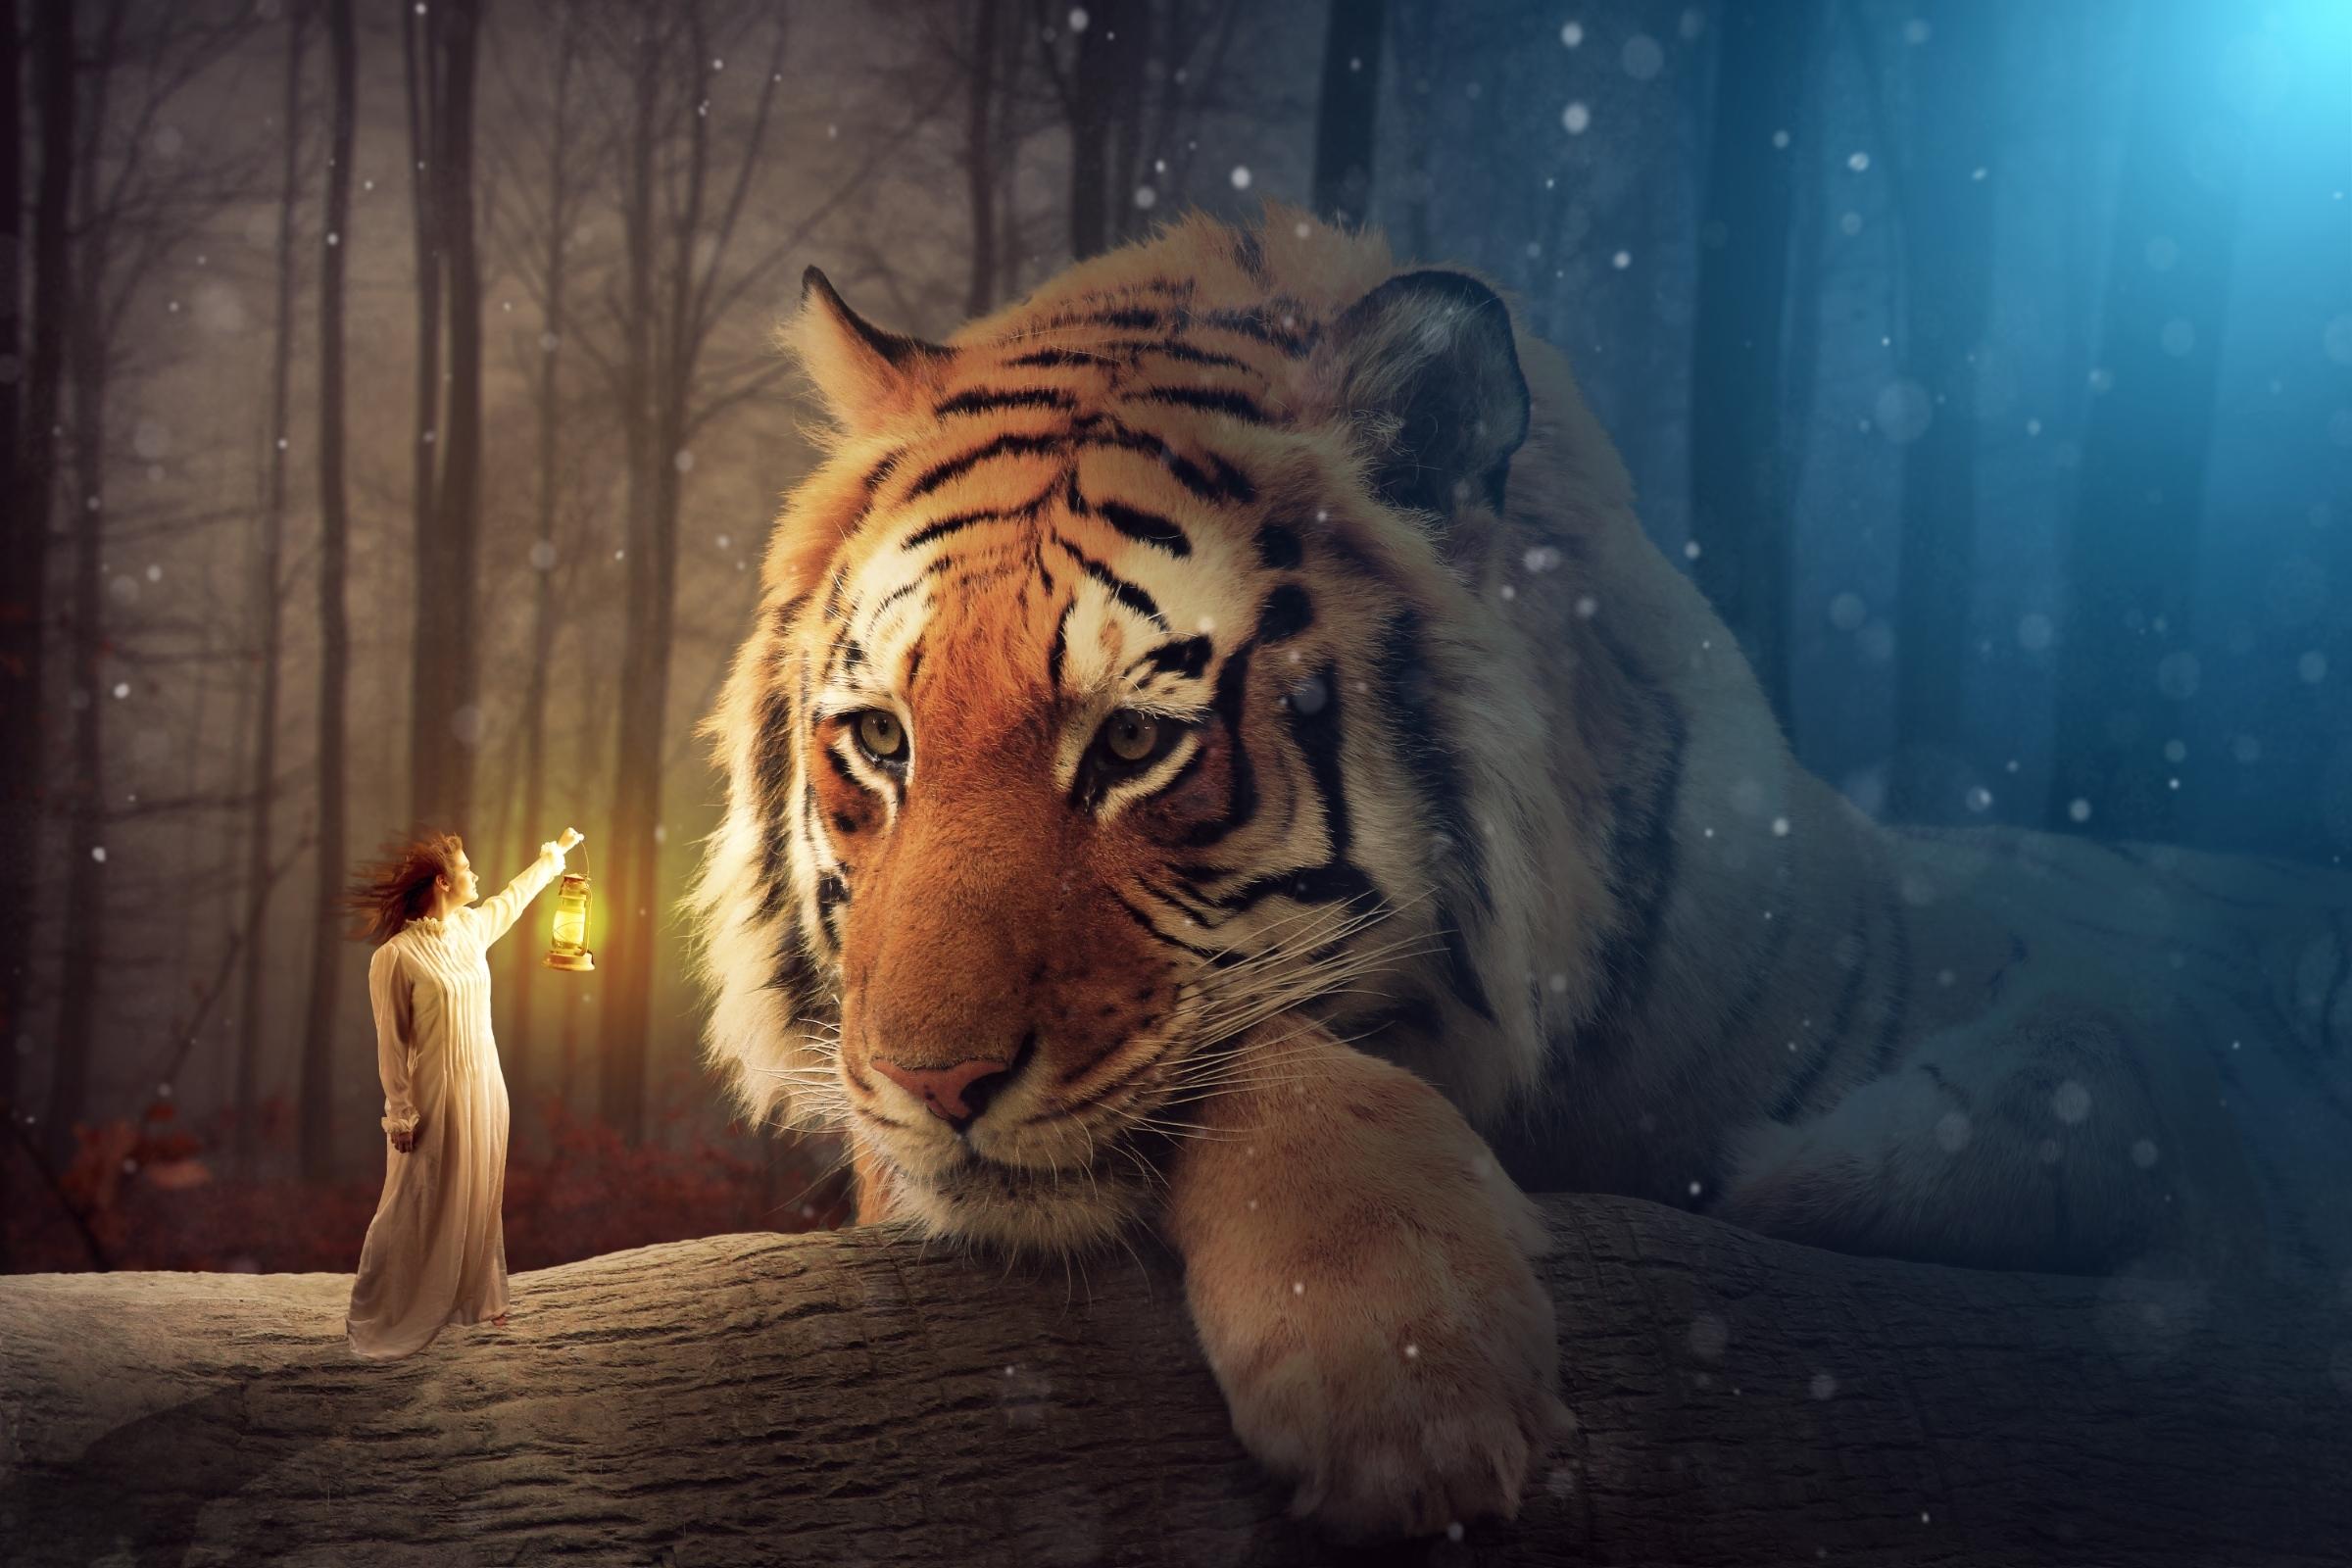 Forest Tiger Girl Lantern 2400x1600